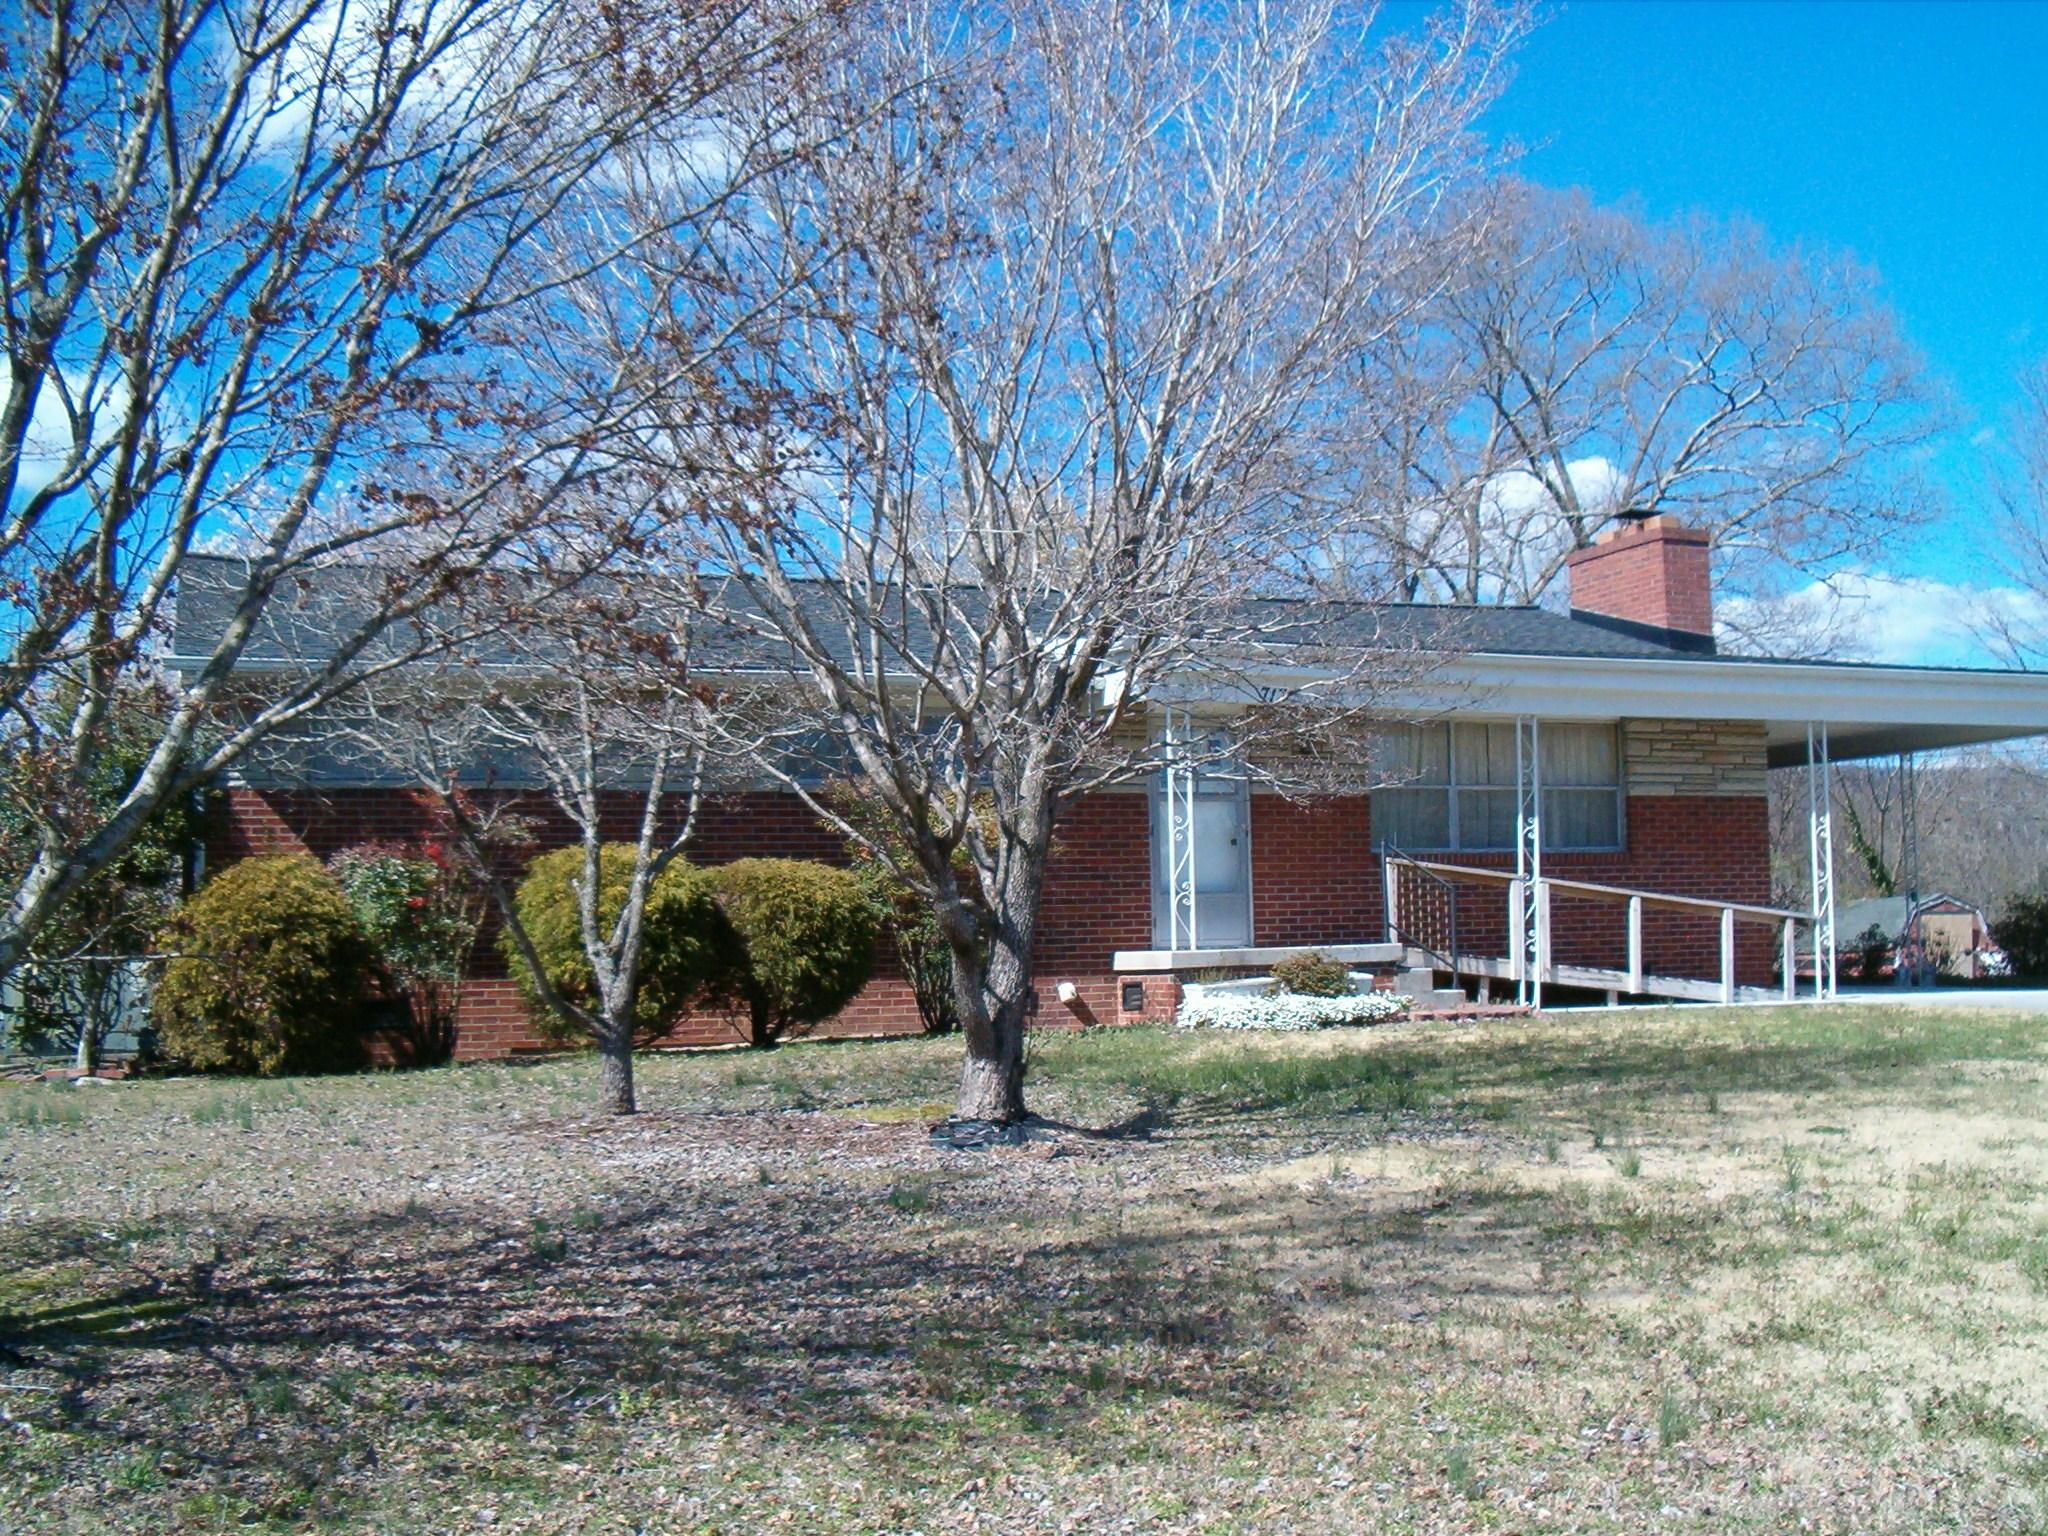 713 Cooper Ave, Rockwood, TN 37854